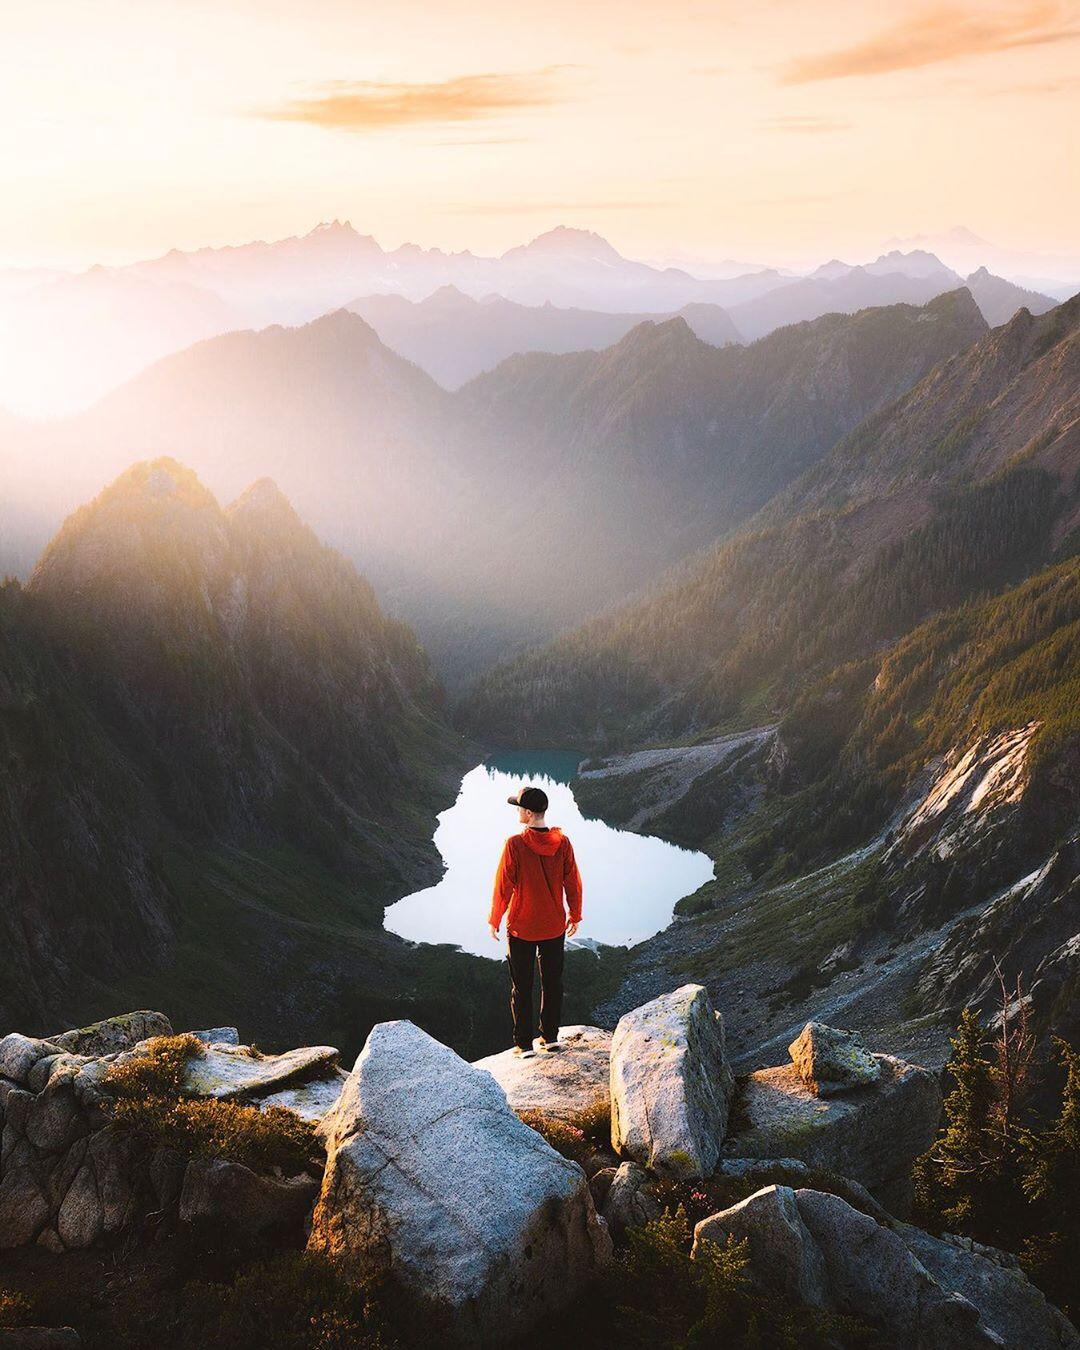 Природа и путешествия на снимках от Matthew Hahnel